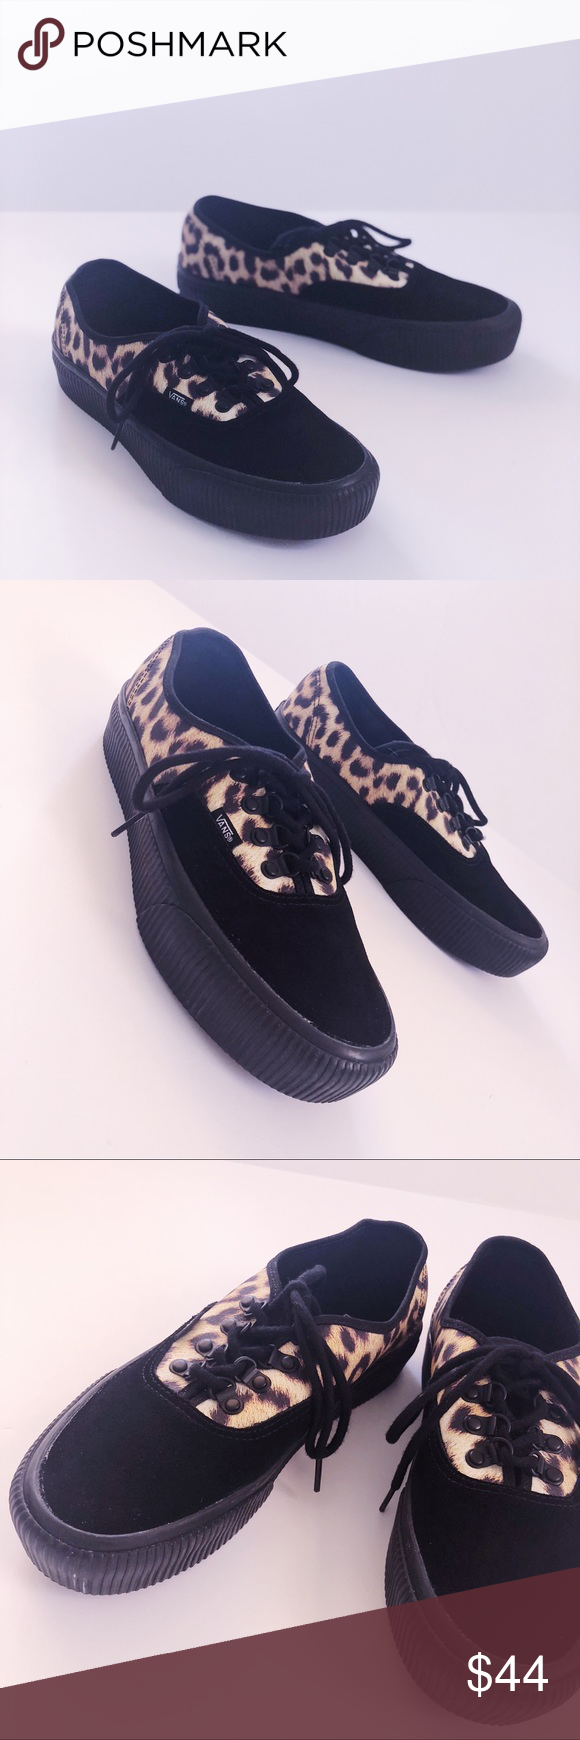 "19c7e76d43a7d2 Vans Authentic Leopard Platform Sneakers 9.5 women Leopard printed and black  suede Vans Authentics with Ribbed 1.75"" Platform. Excellent used condition  ..."